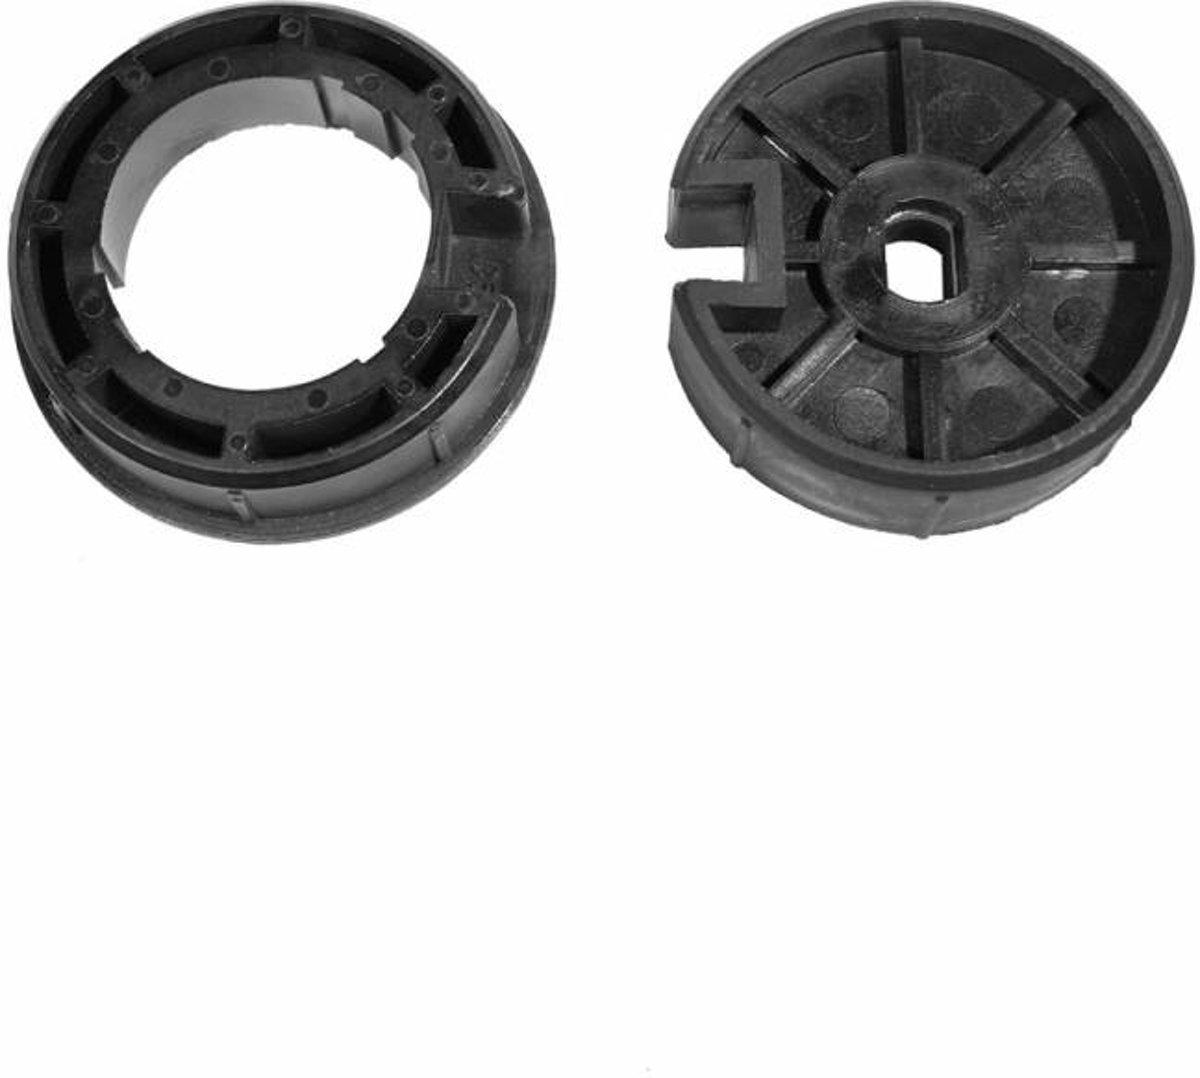 Brel Adaptieset 45 mm - as Ø 70 mm kopen